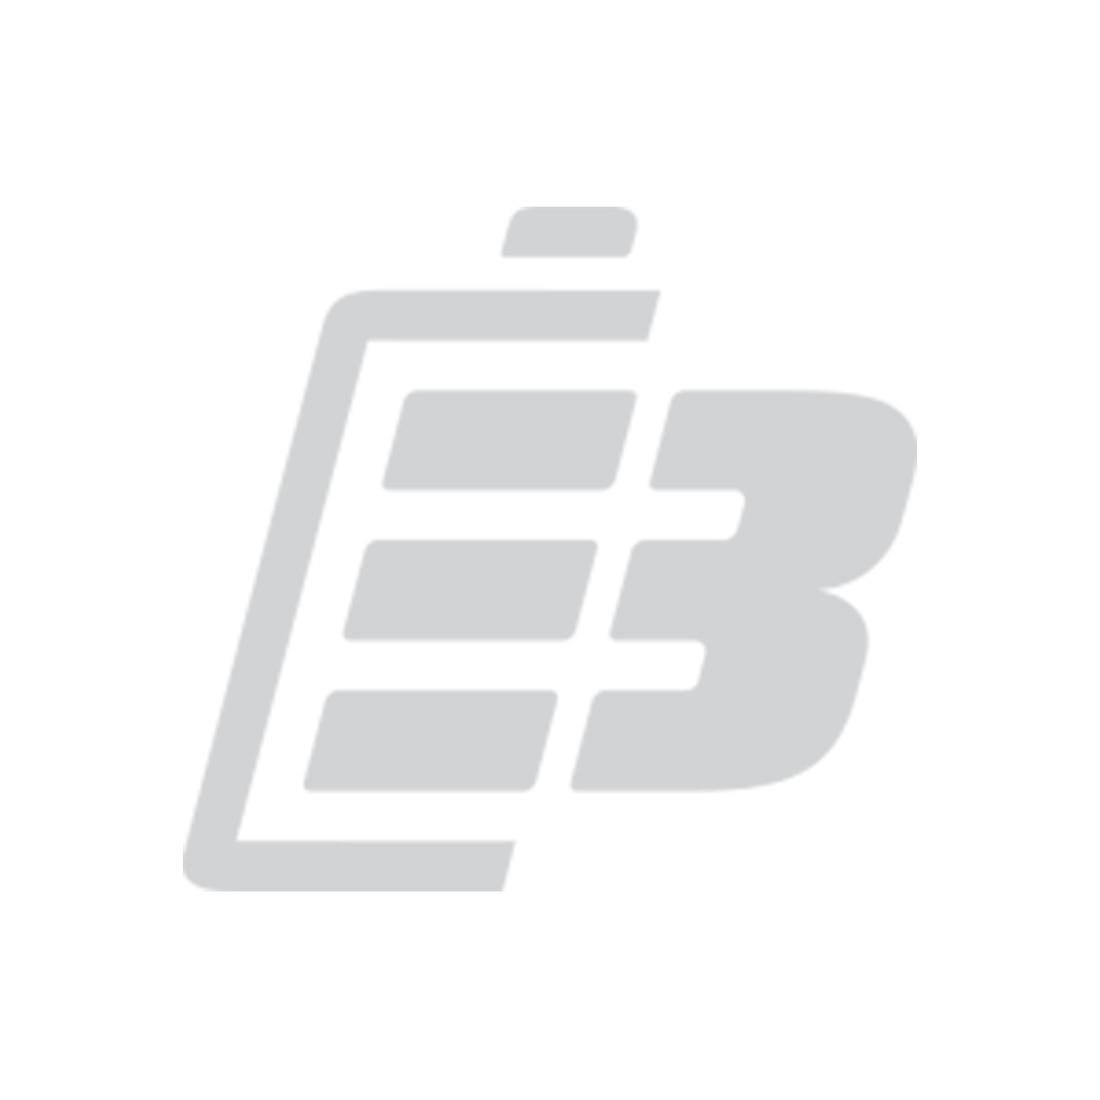 Choetech SC006 36W Foldable Solar Charger